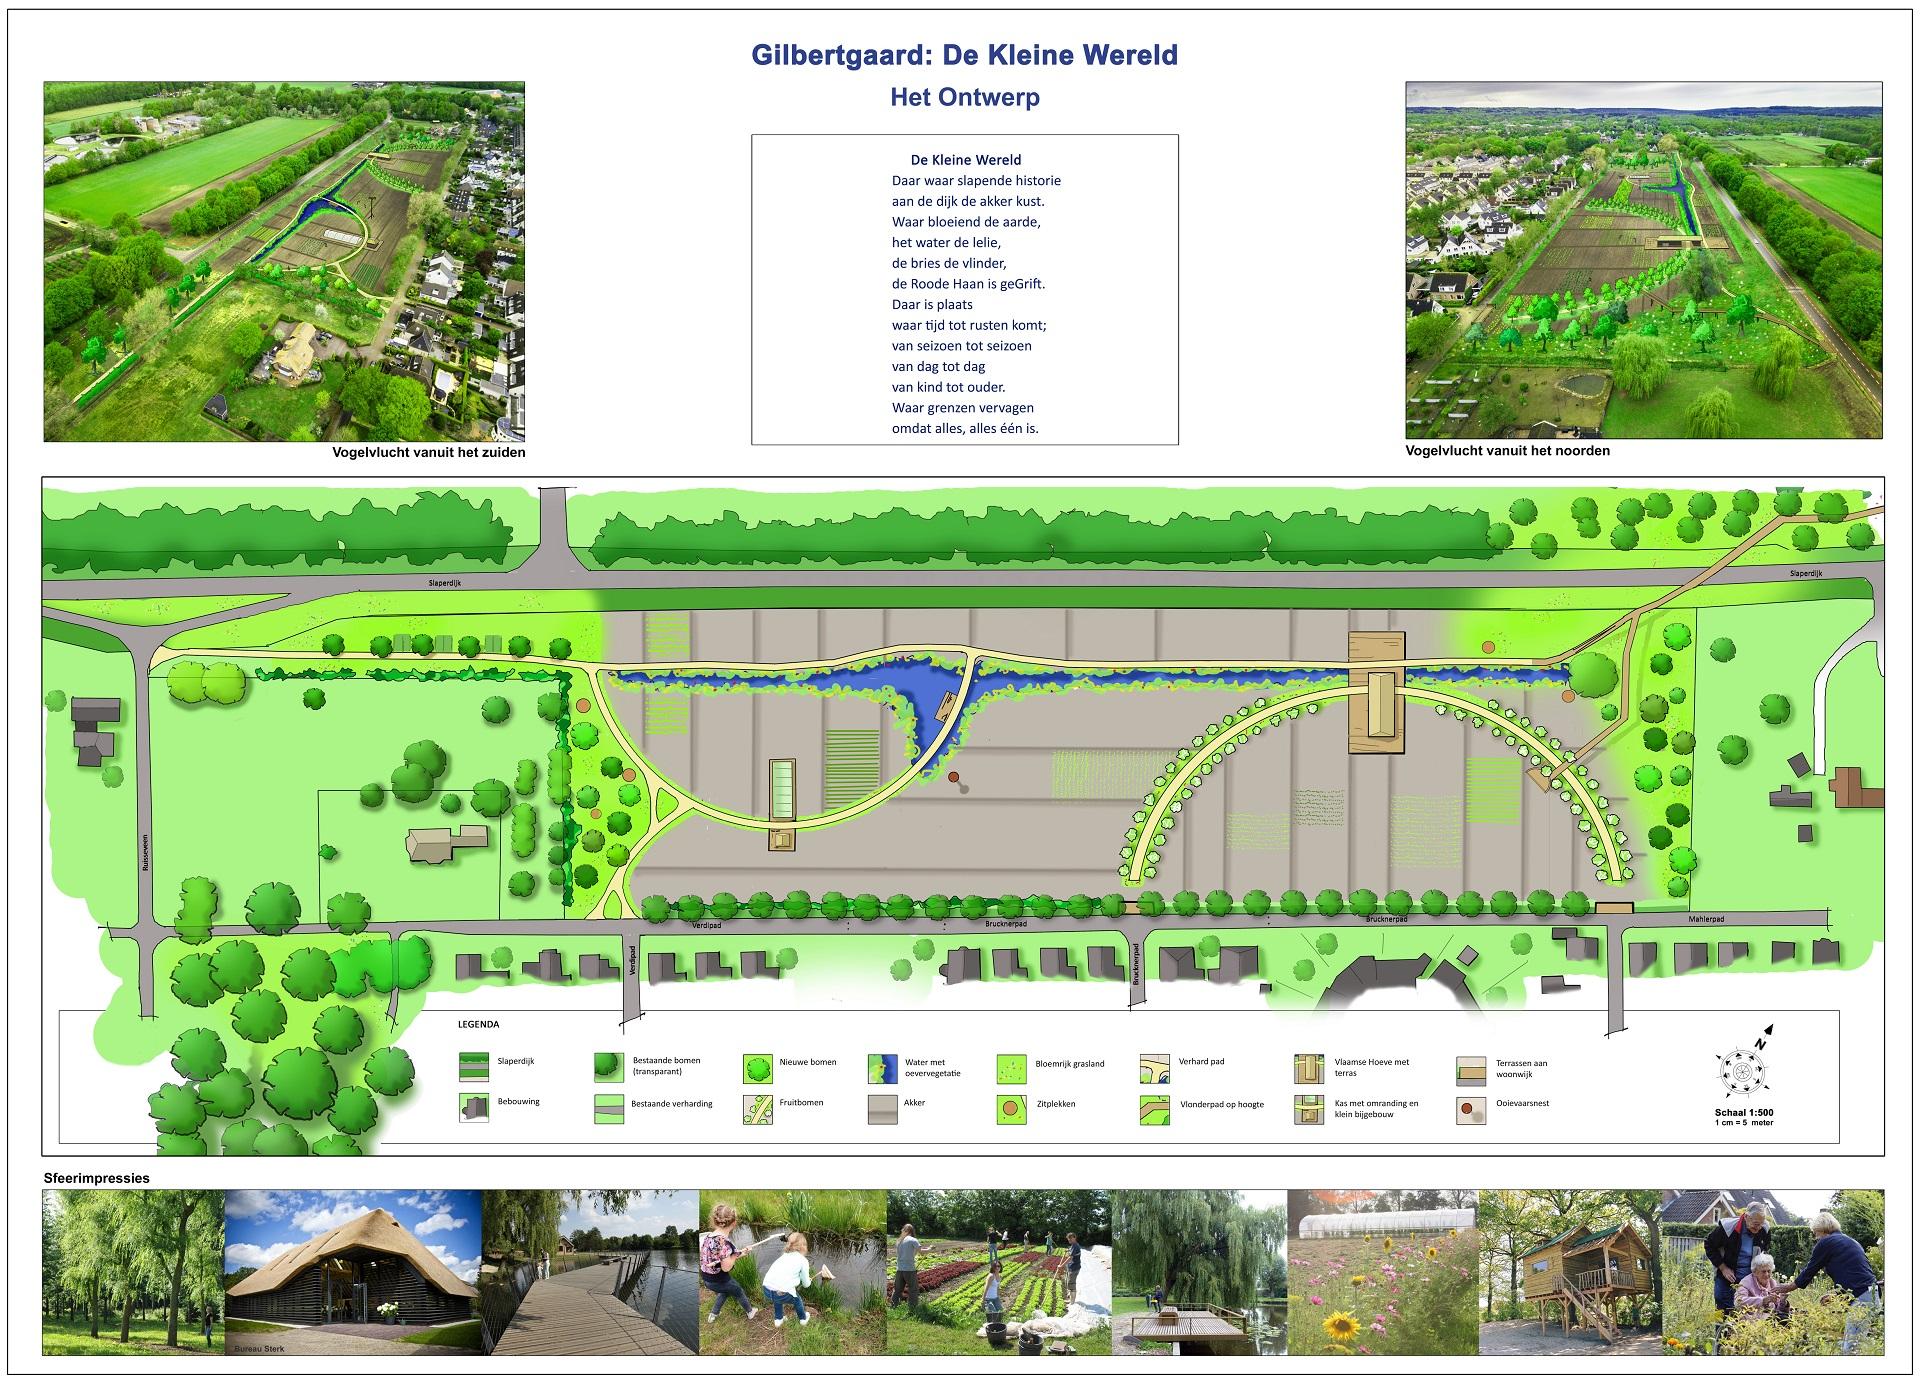 Prijsvraag-Gilbertgaard - Project_Prijsvraag-Gilbertgaard_003